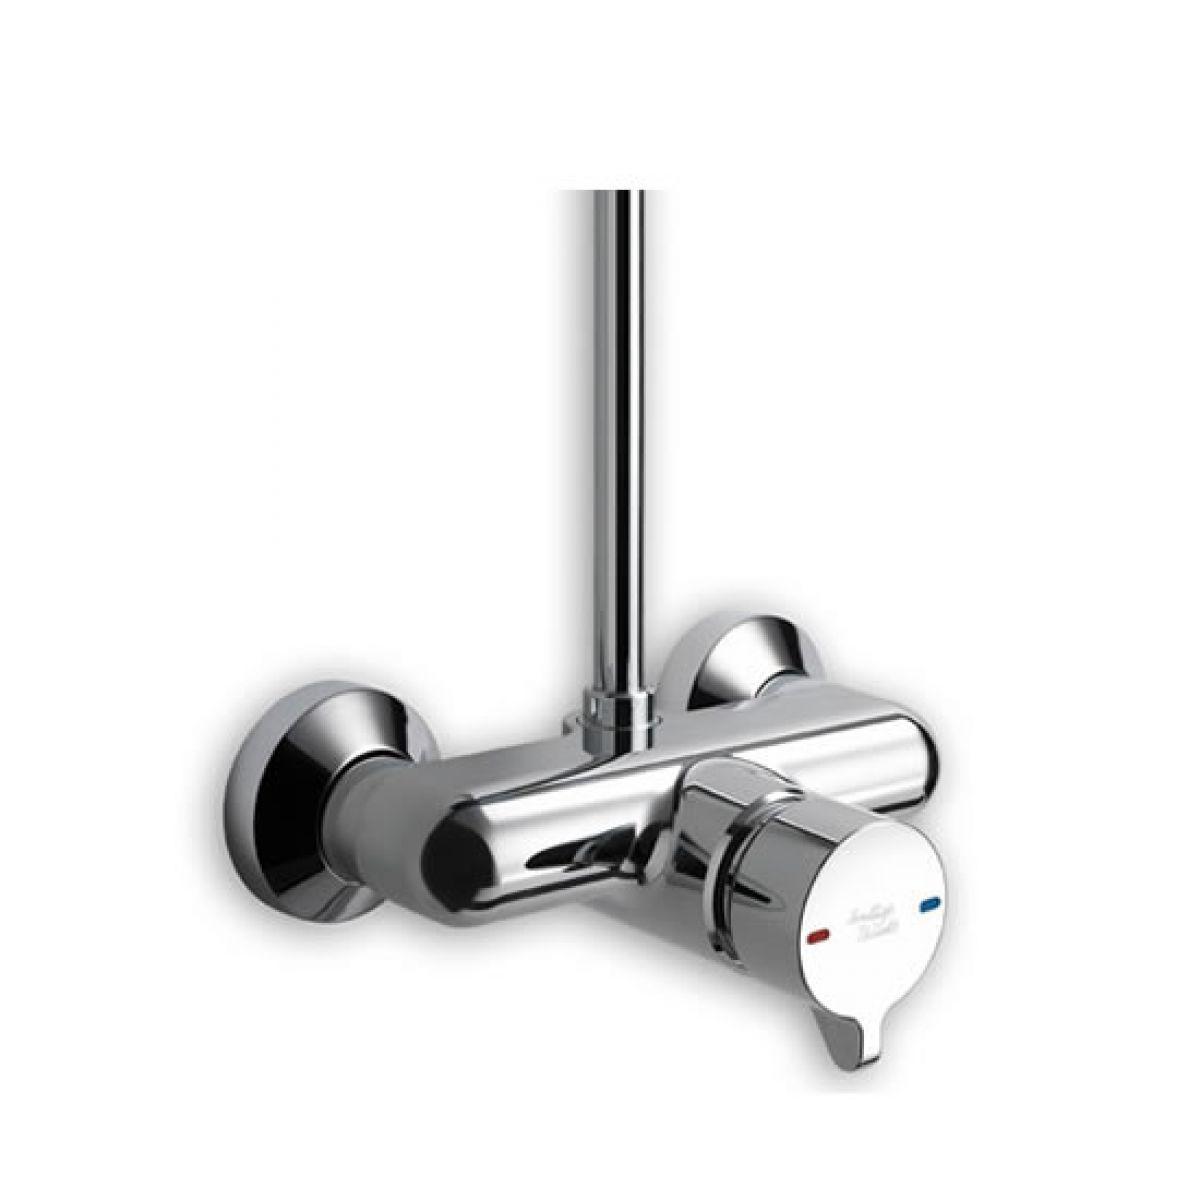 armitage shanks avon 21 exposed shower valve - Shower Valves